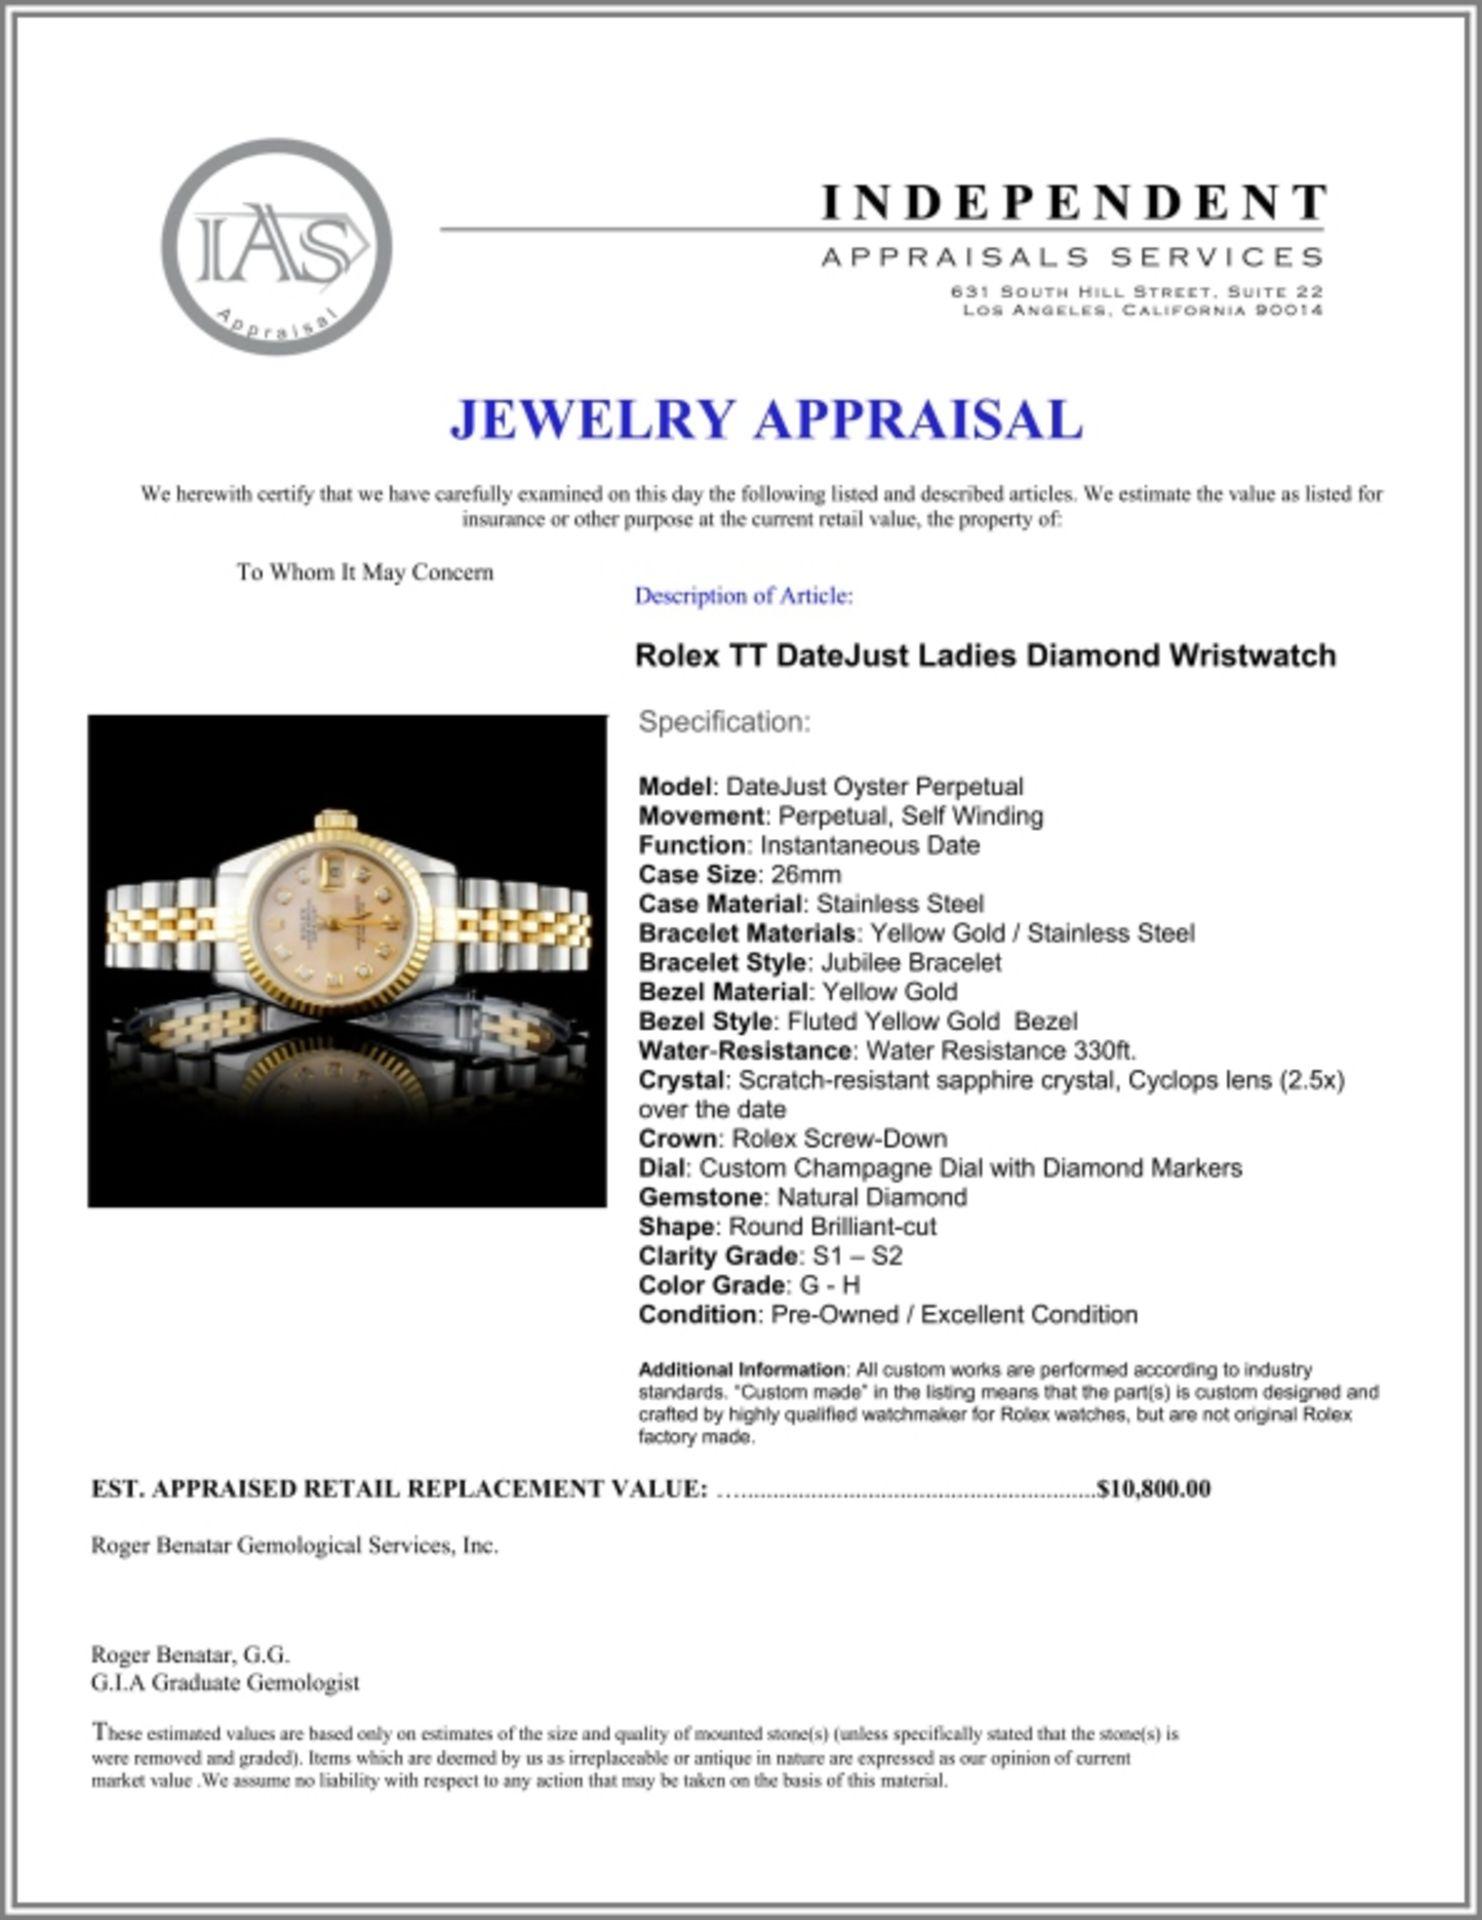 Rolex DateJust Ladies Diamond Wristwatch - Image 5 of 5